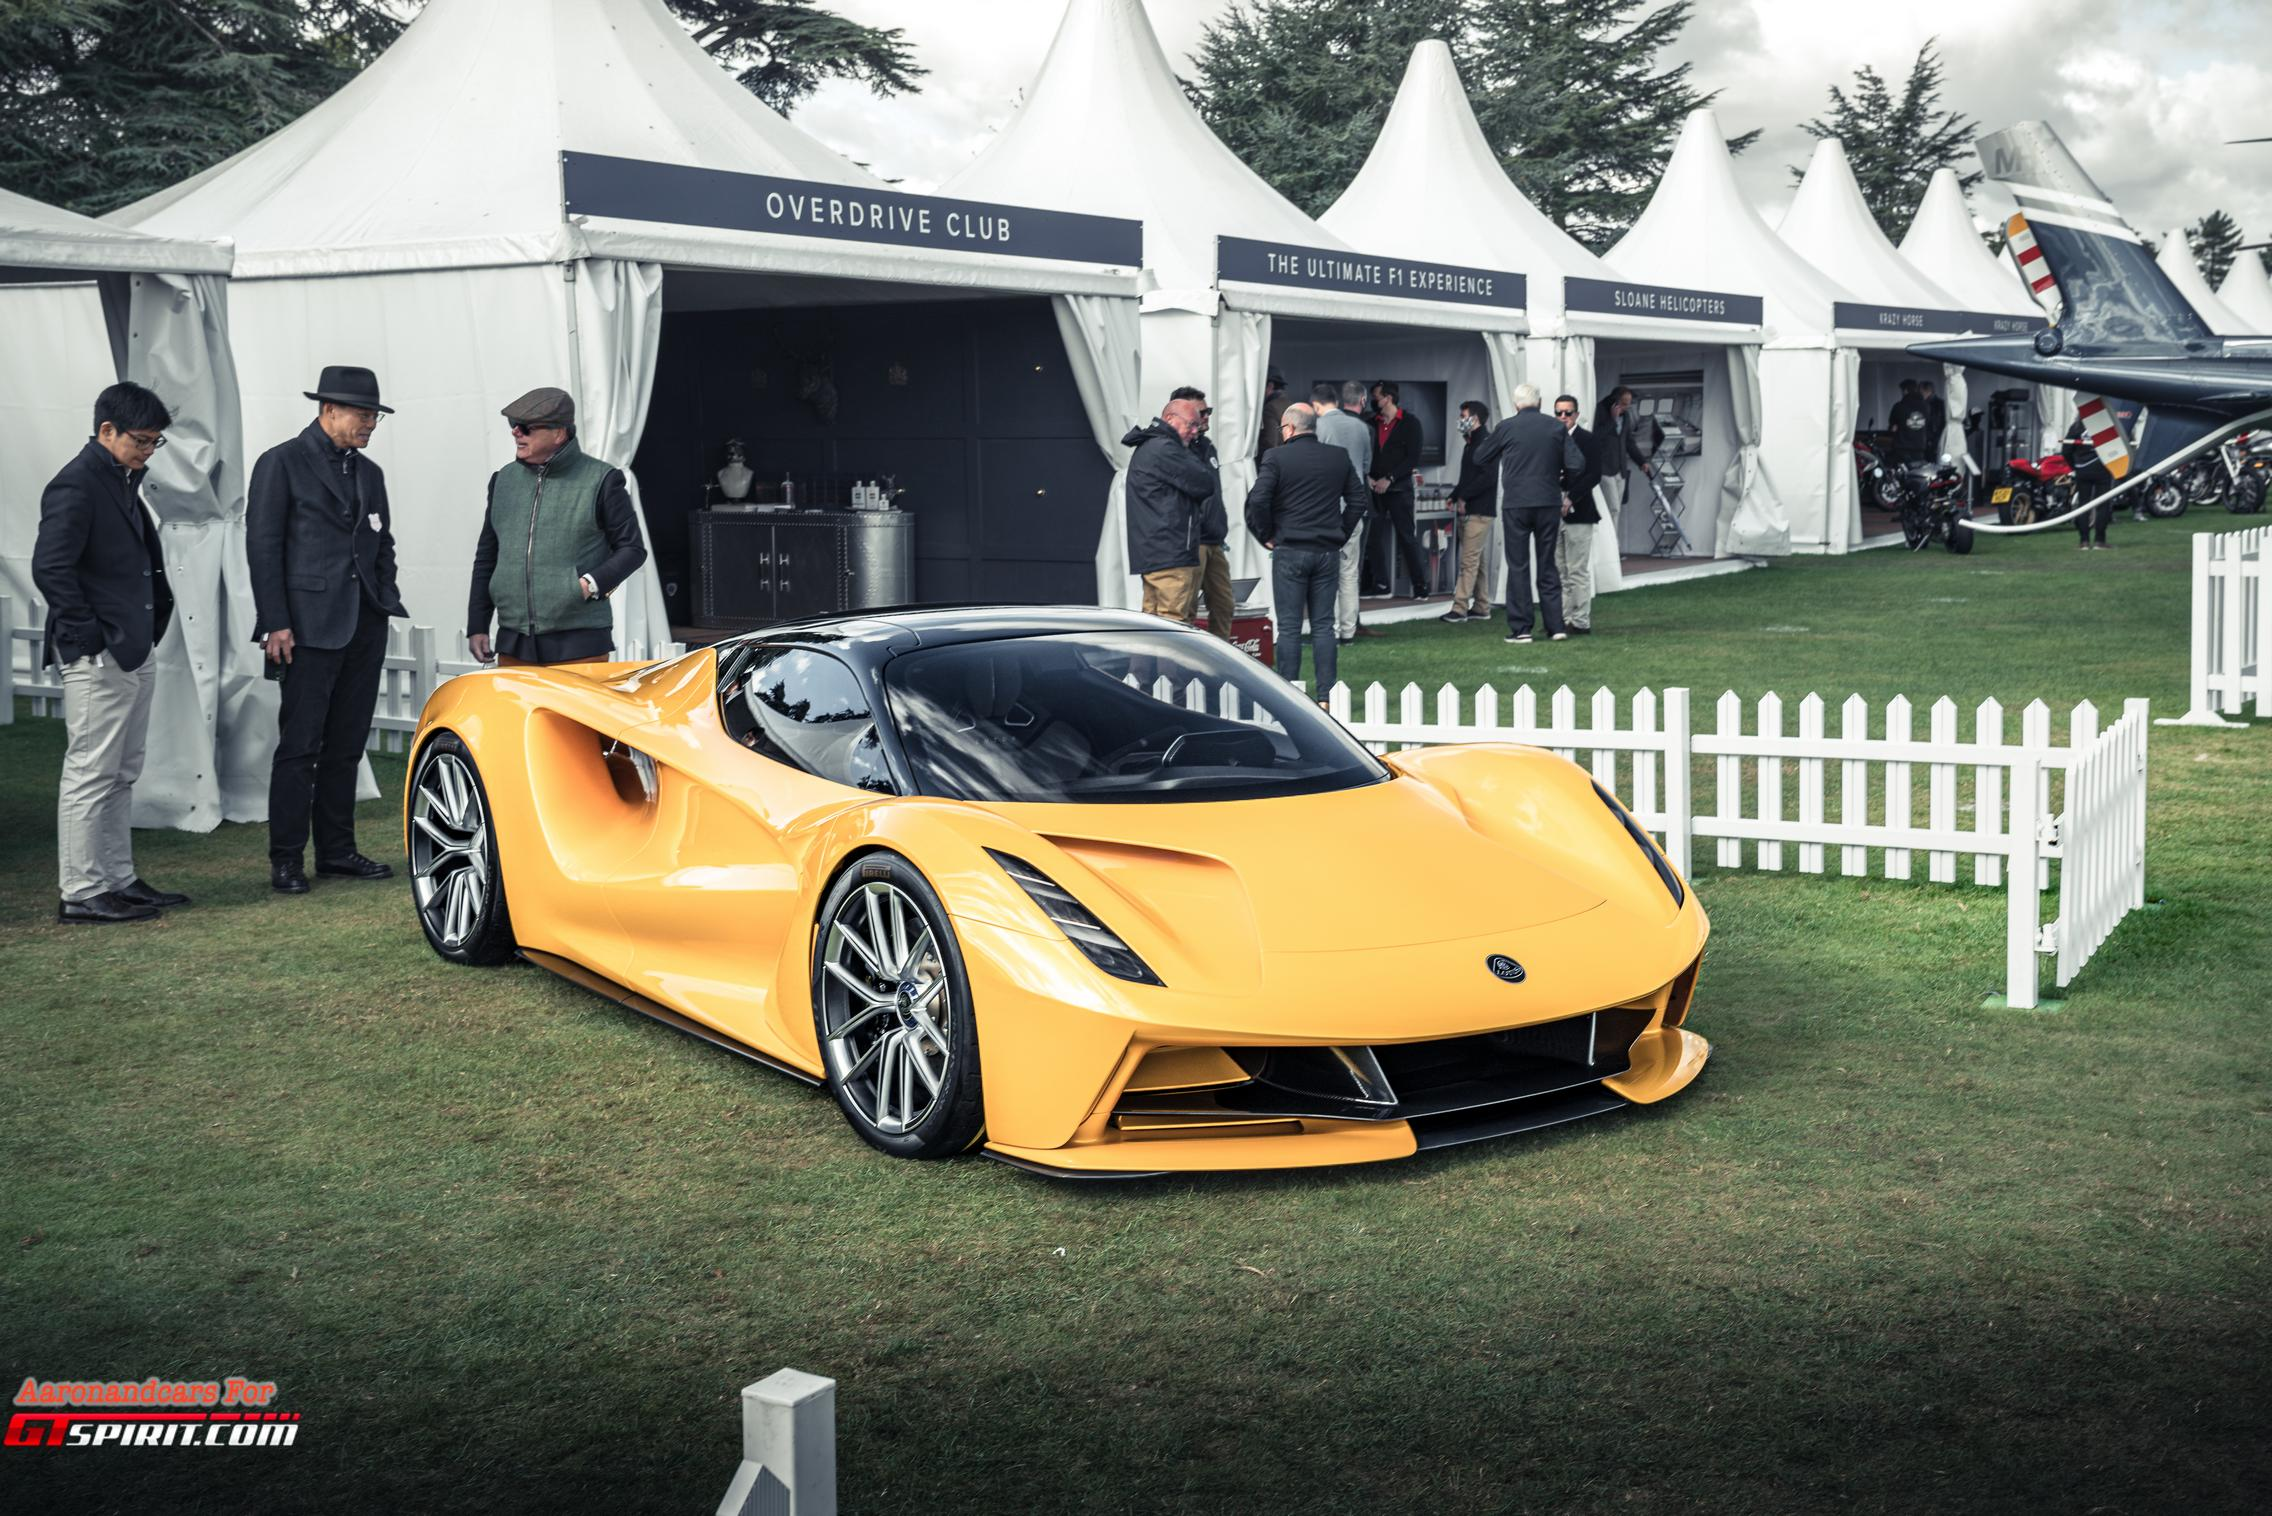 Salon Prive 2020 Lotus Evija